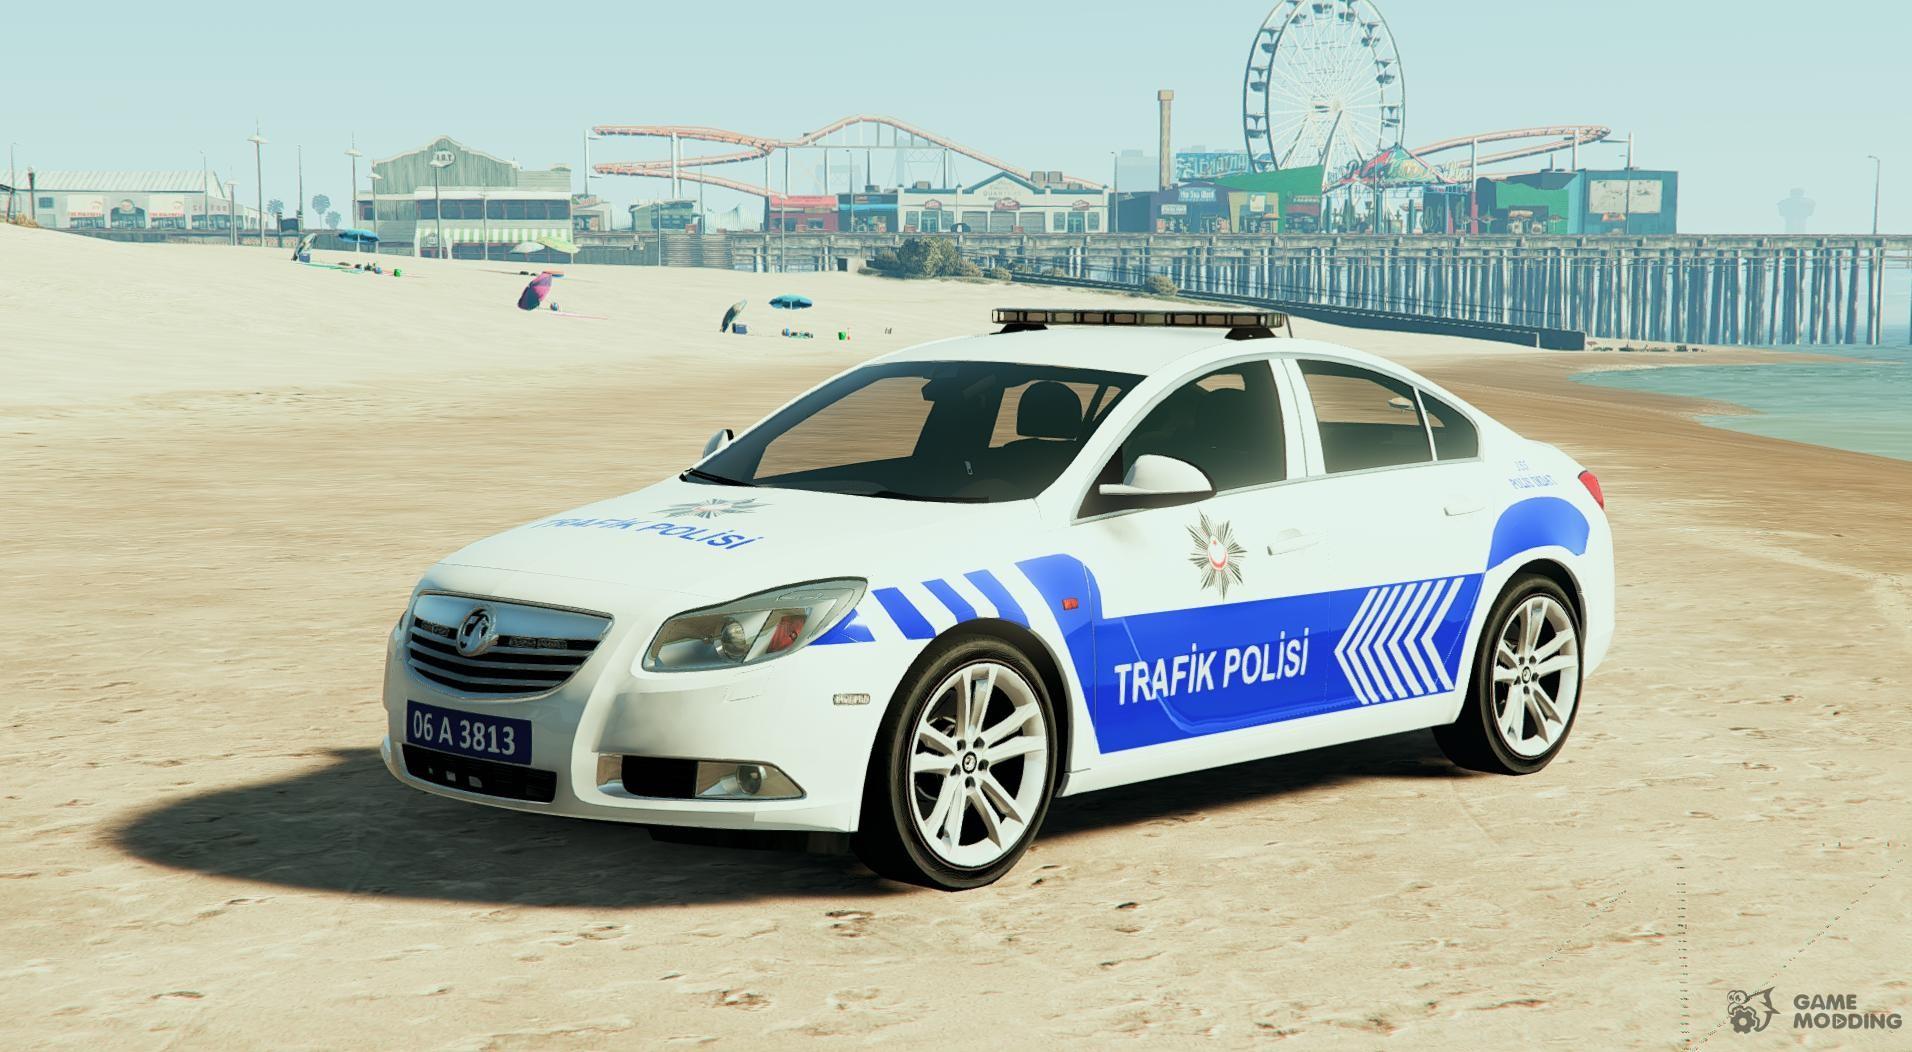 opel insignia 2016 yeni türk trafik polisi for gta 5